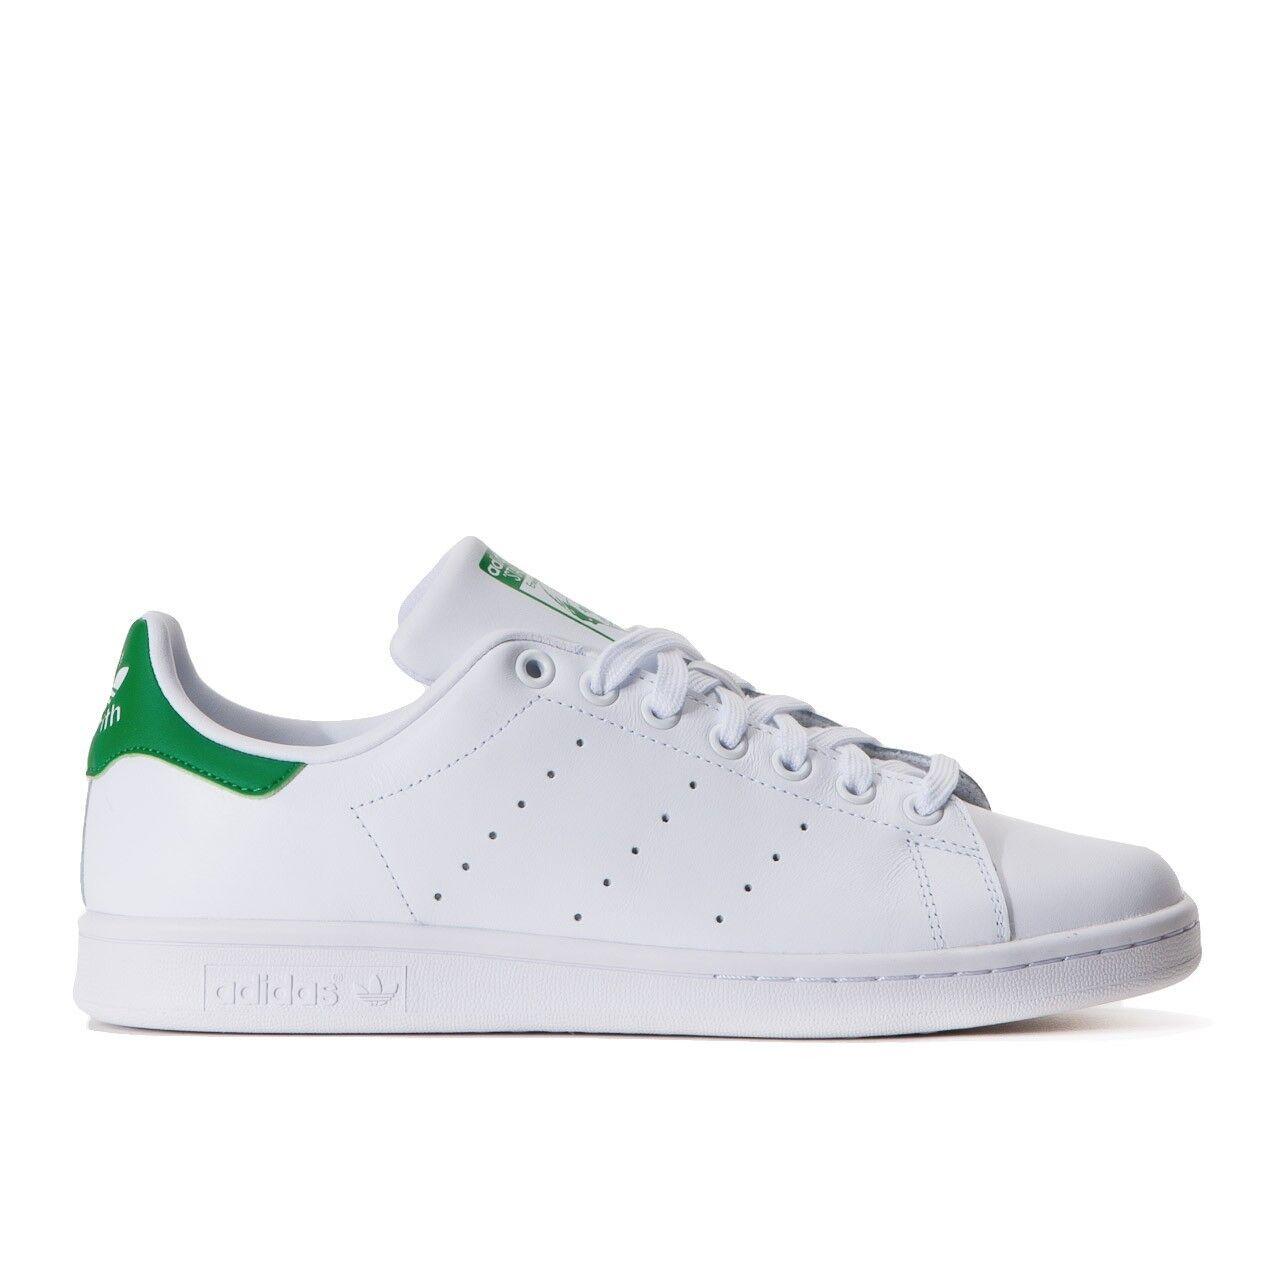 Adidas original Stan Smith White Green Nuove New shoes US9,5 EU43 M20324